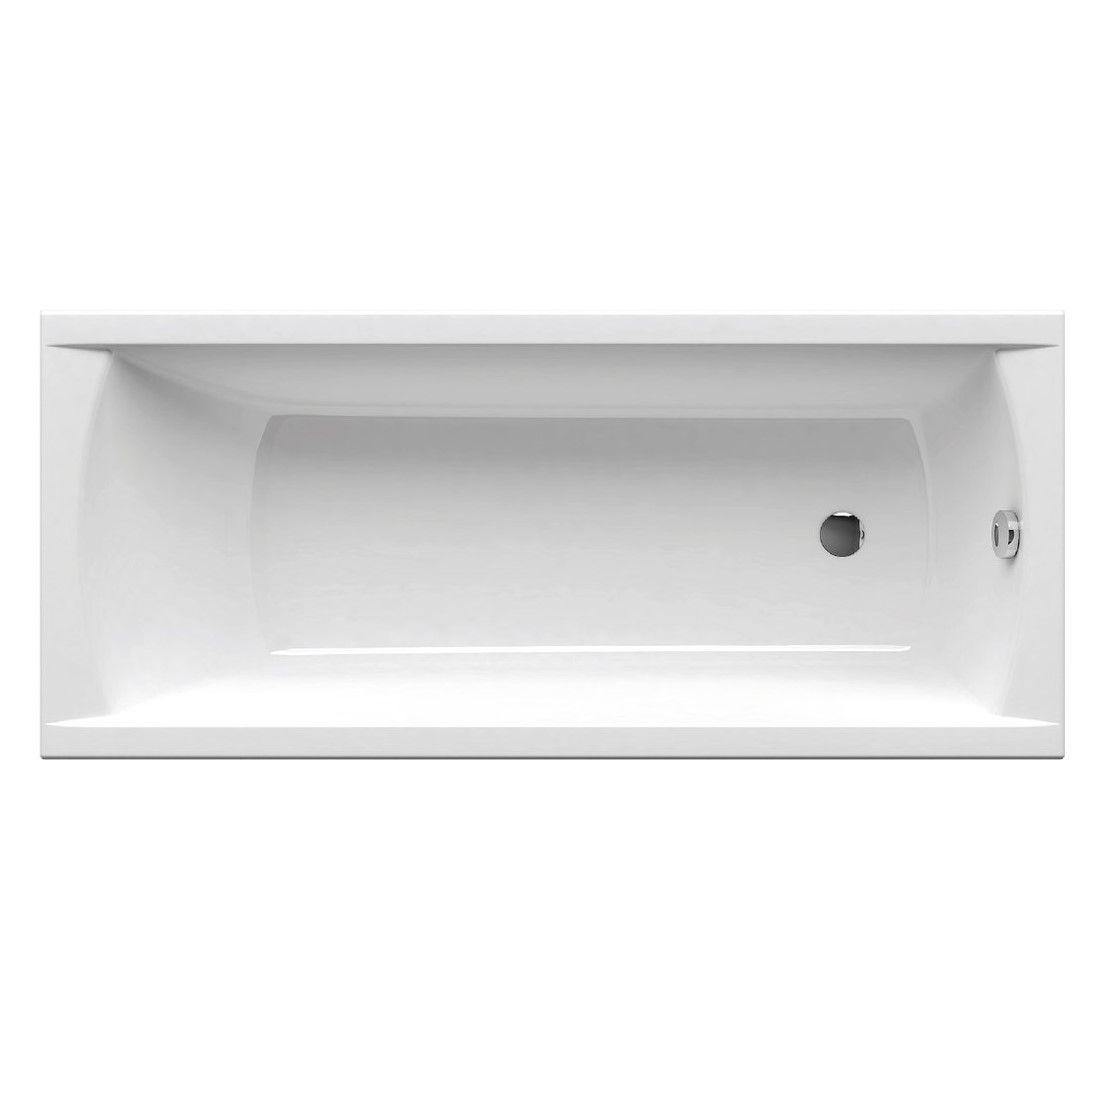 Прямоугольная ванна Ravak Classic 150x70 ФОТО